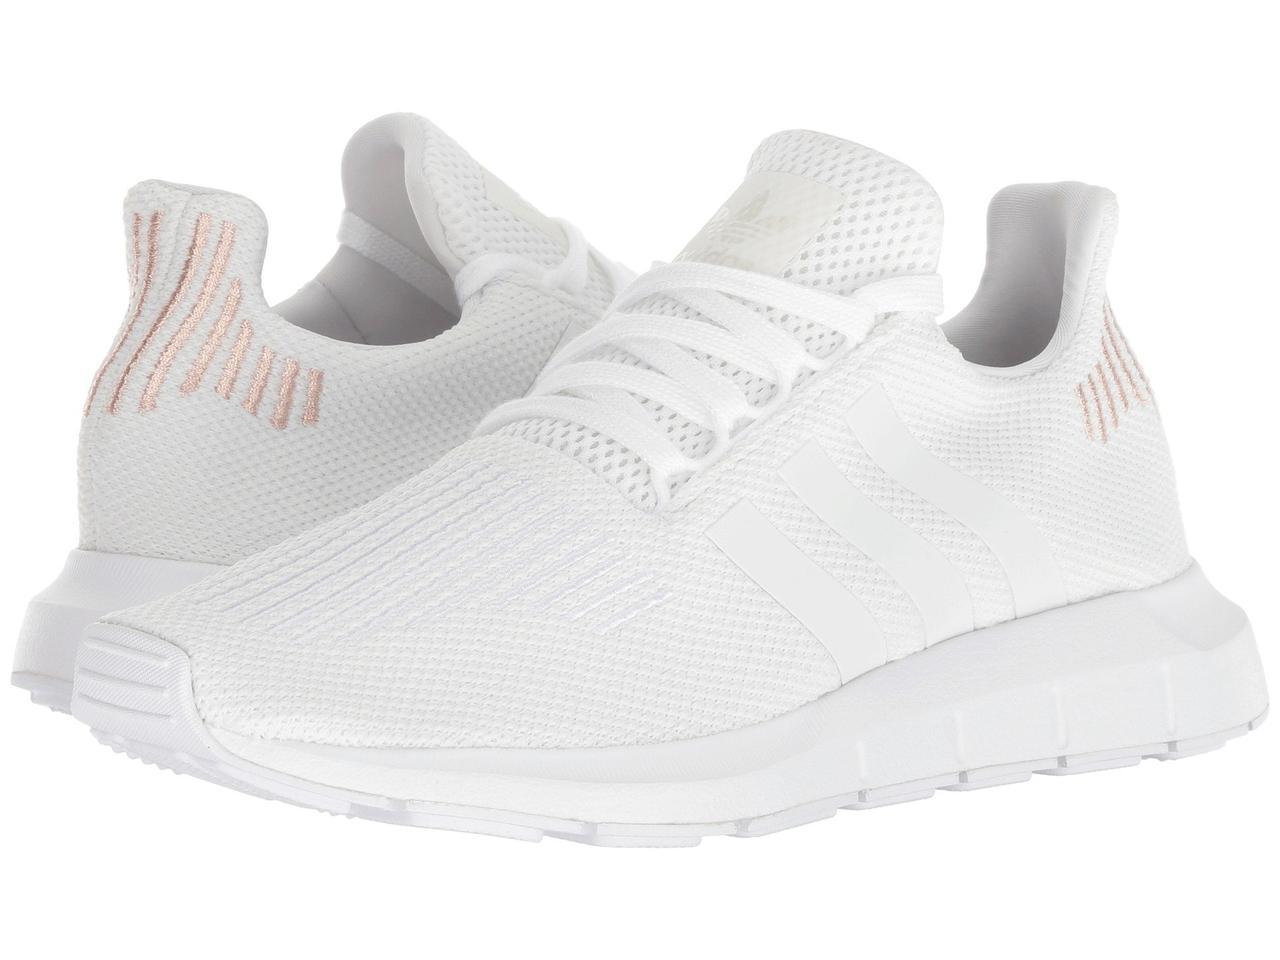 12130e7d Кроссовки/Кеды (Оригинал) adidas Originals Swift Run W White/Crystal White/